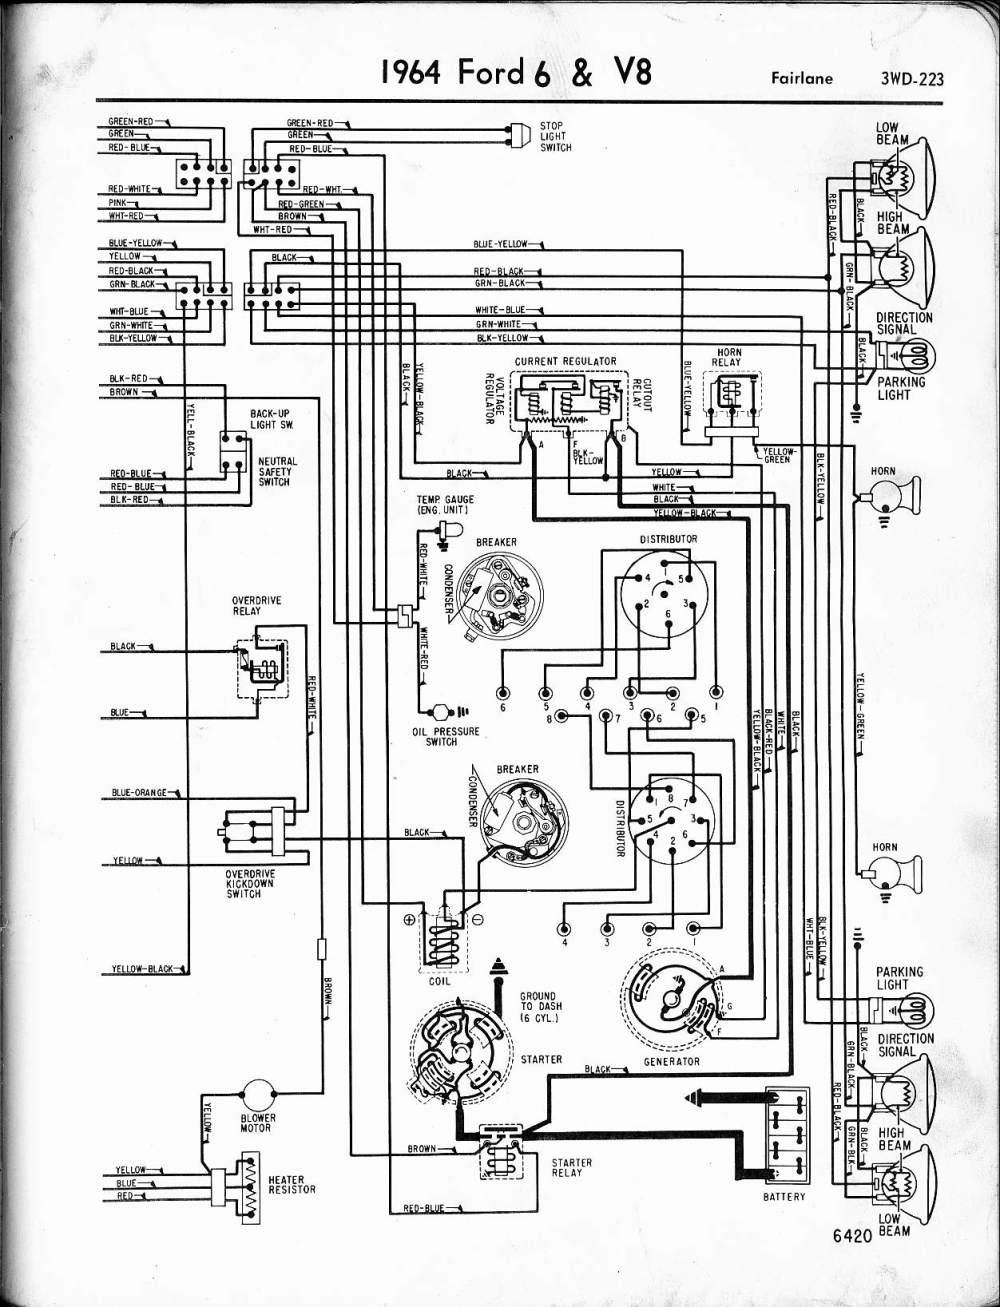 56 Thunderbird Wiring Diagram Headlight - grote light wiring diagram on 1964 ford falcon wiring, 1964 ford galaxie ignition wiring, 1964 ford ignition switch diagram, 1964 ford f-150,